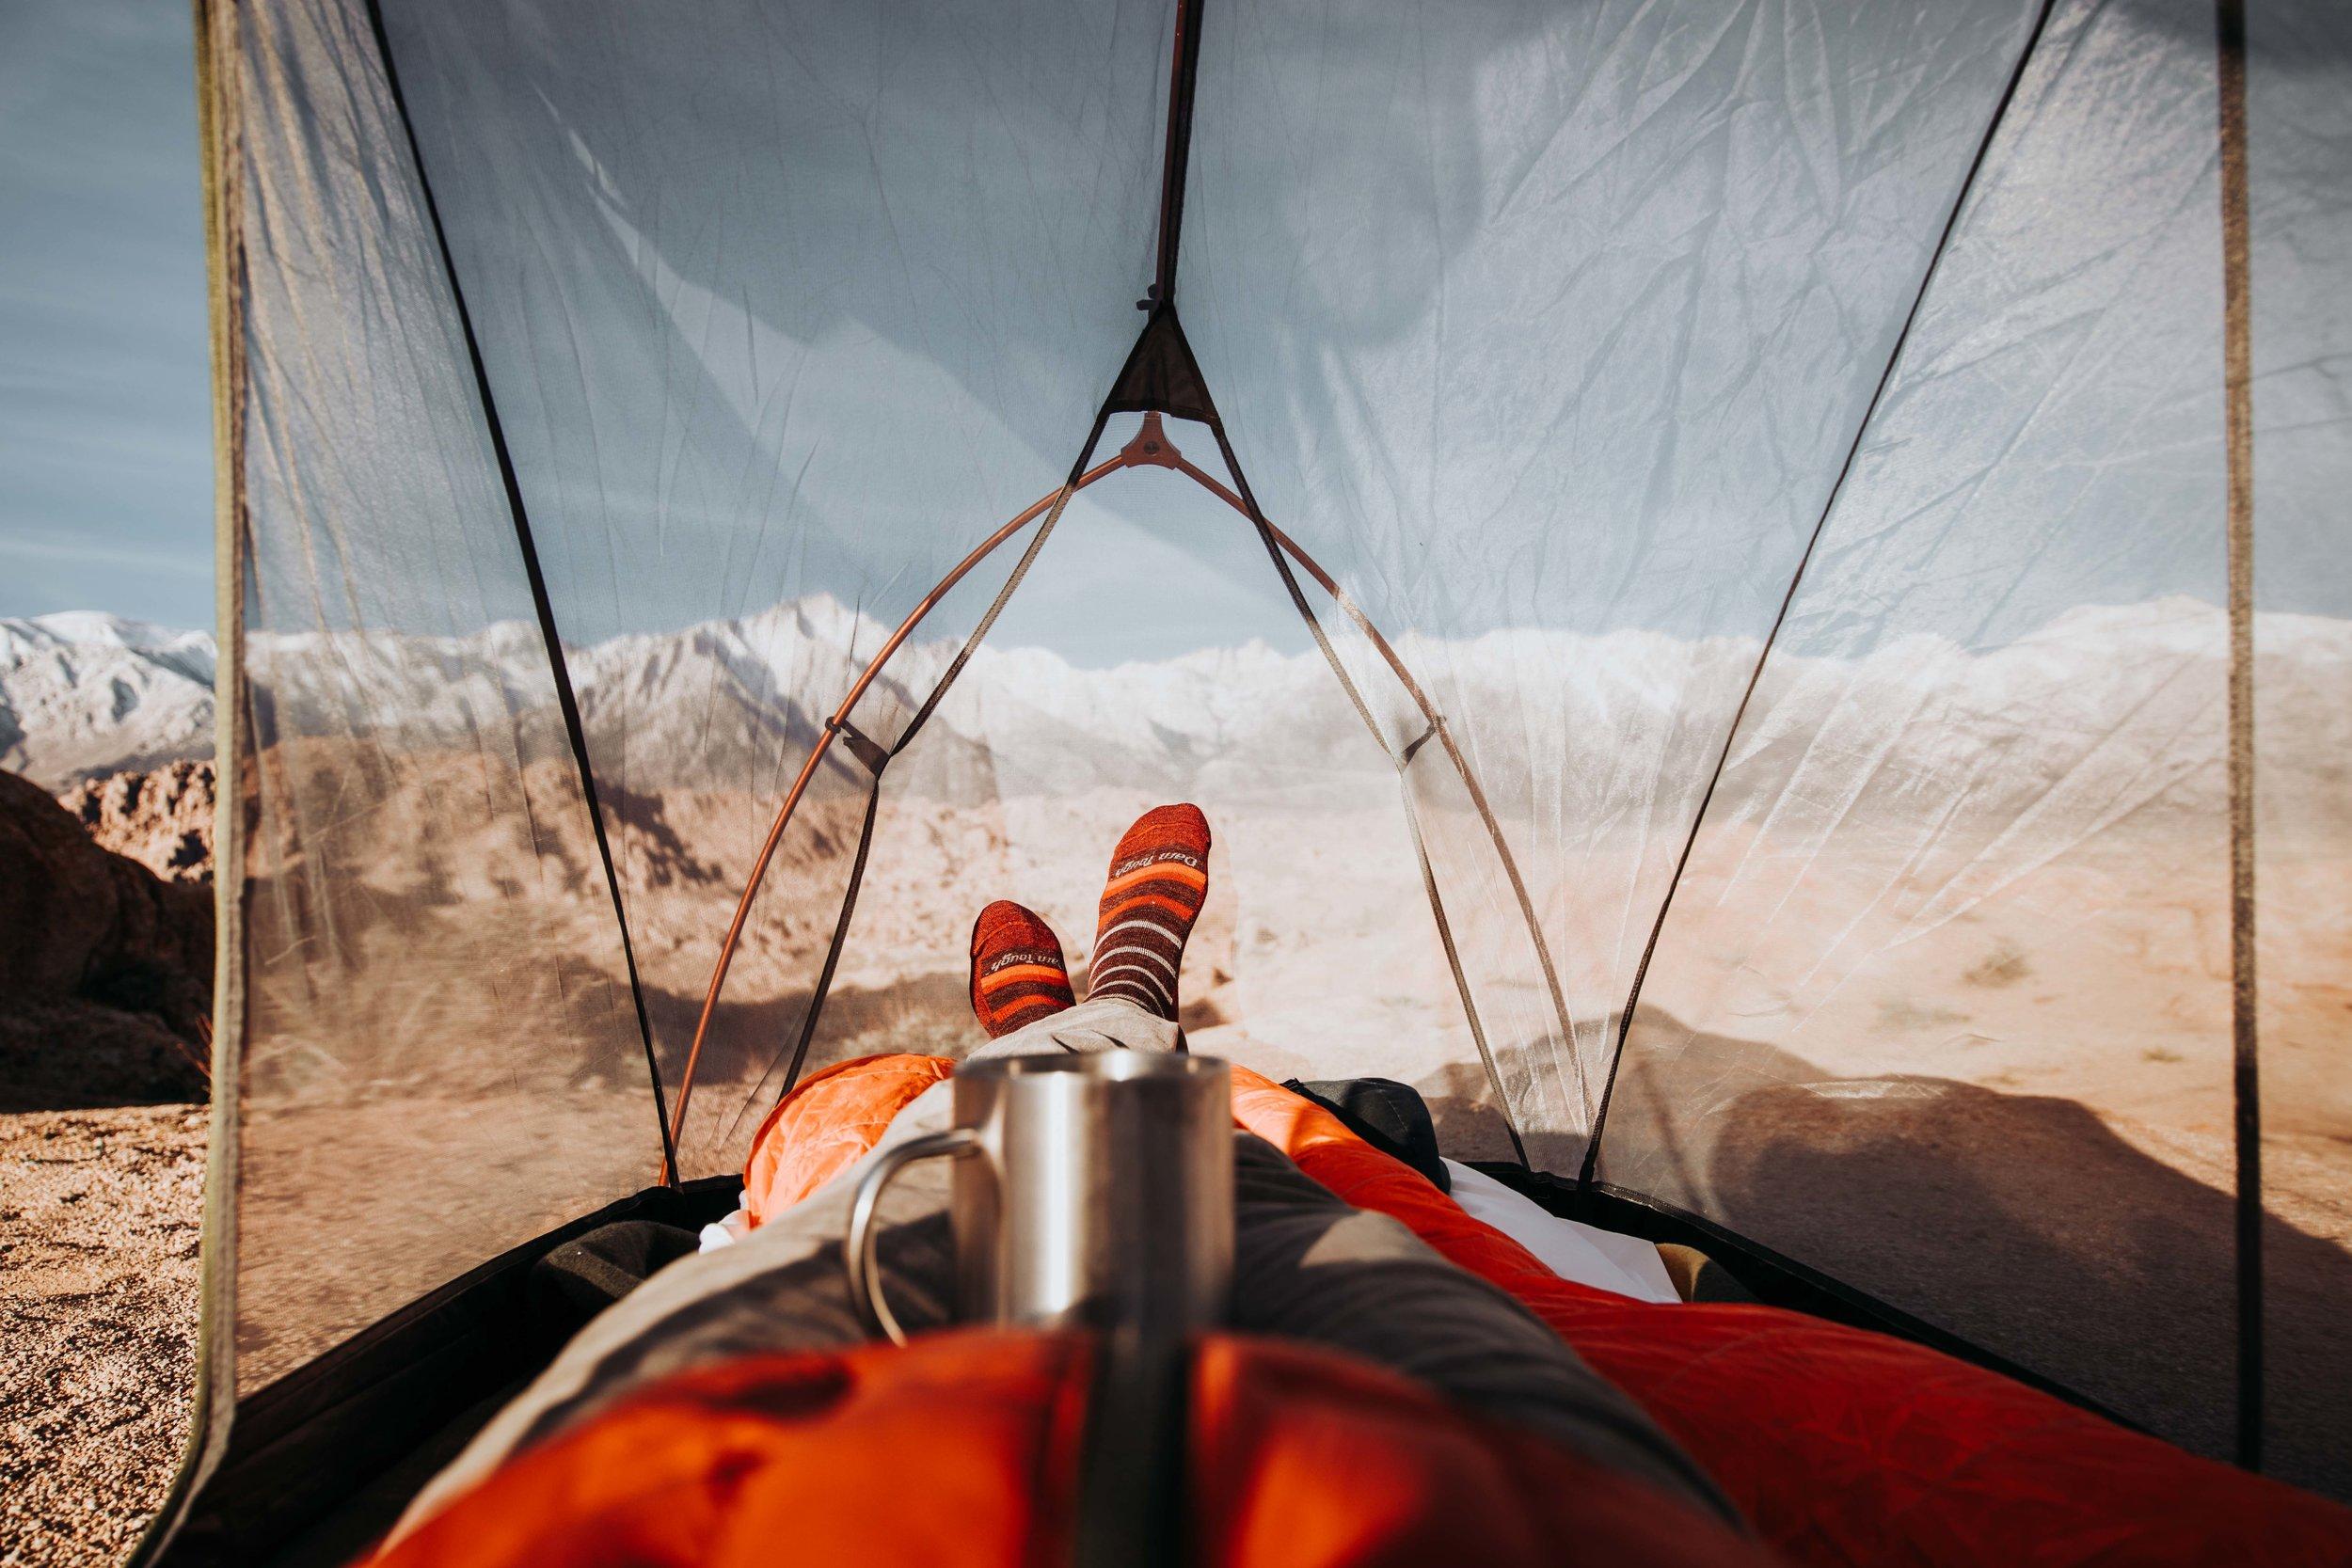 Eastern Sierra - with Darn Tough Socks